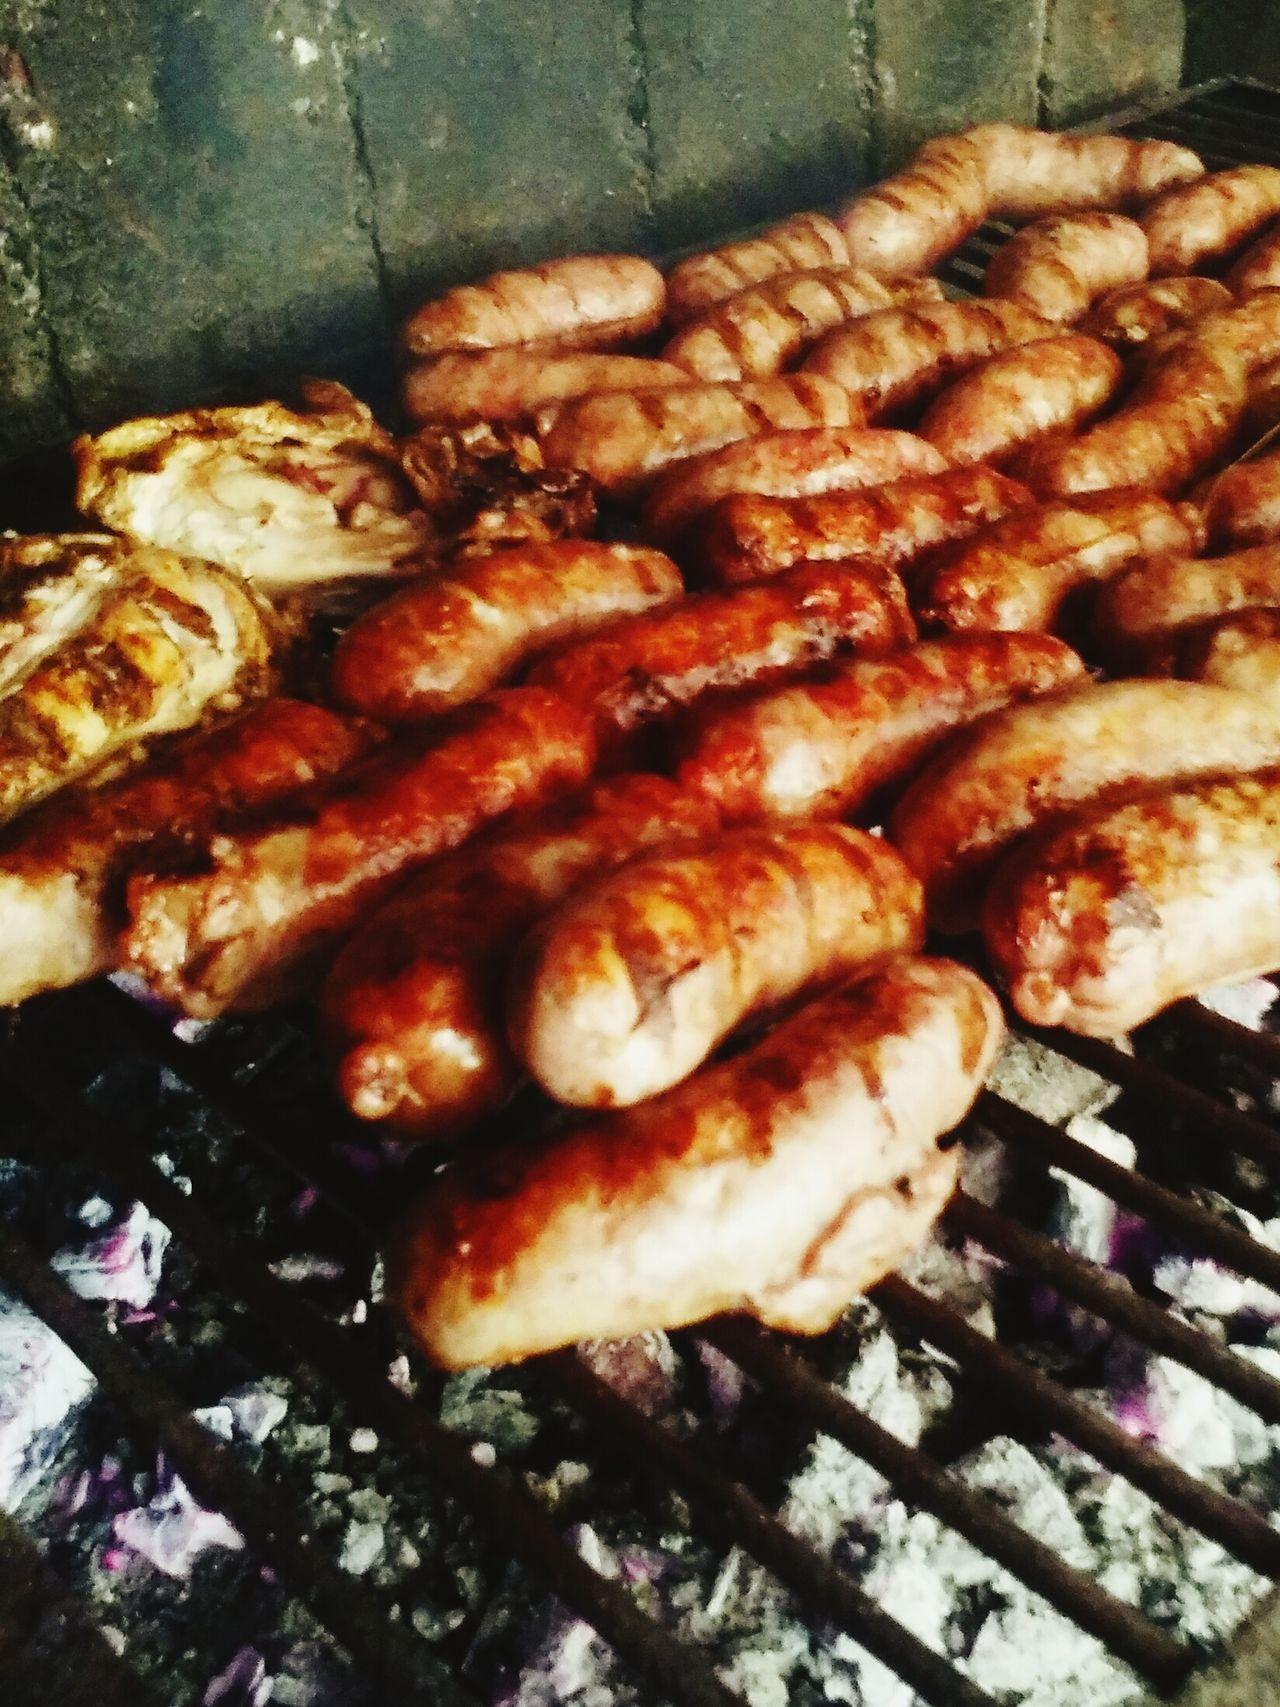 Food Grilled Chorizos  Choripaneada Chorizo Argentino Mmmm!!!